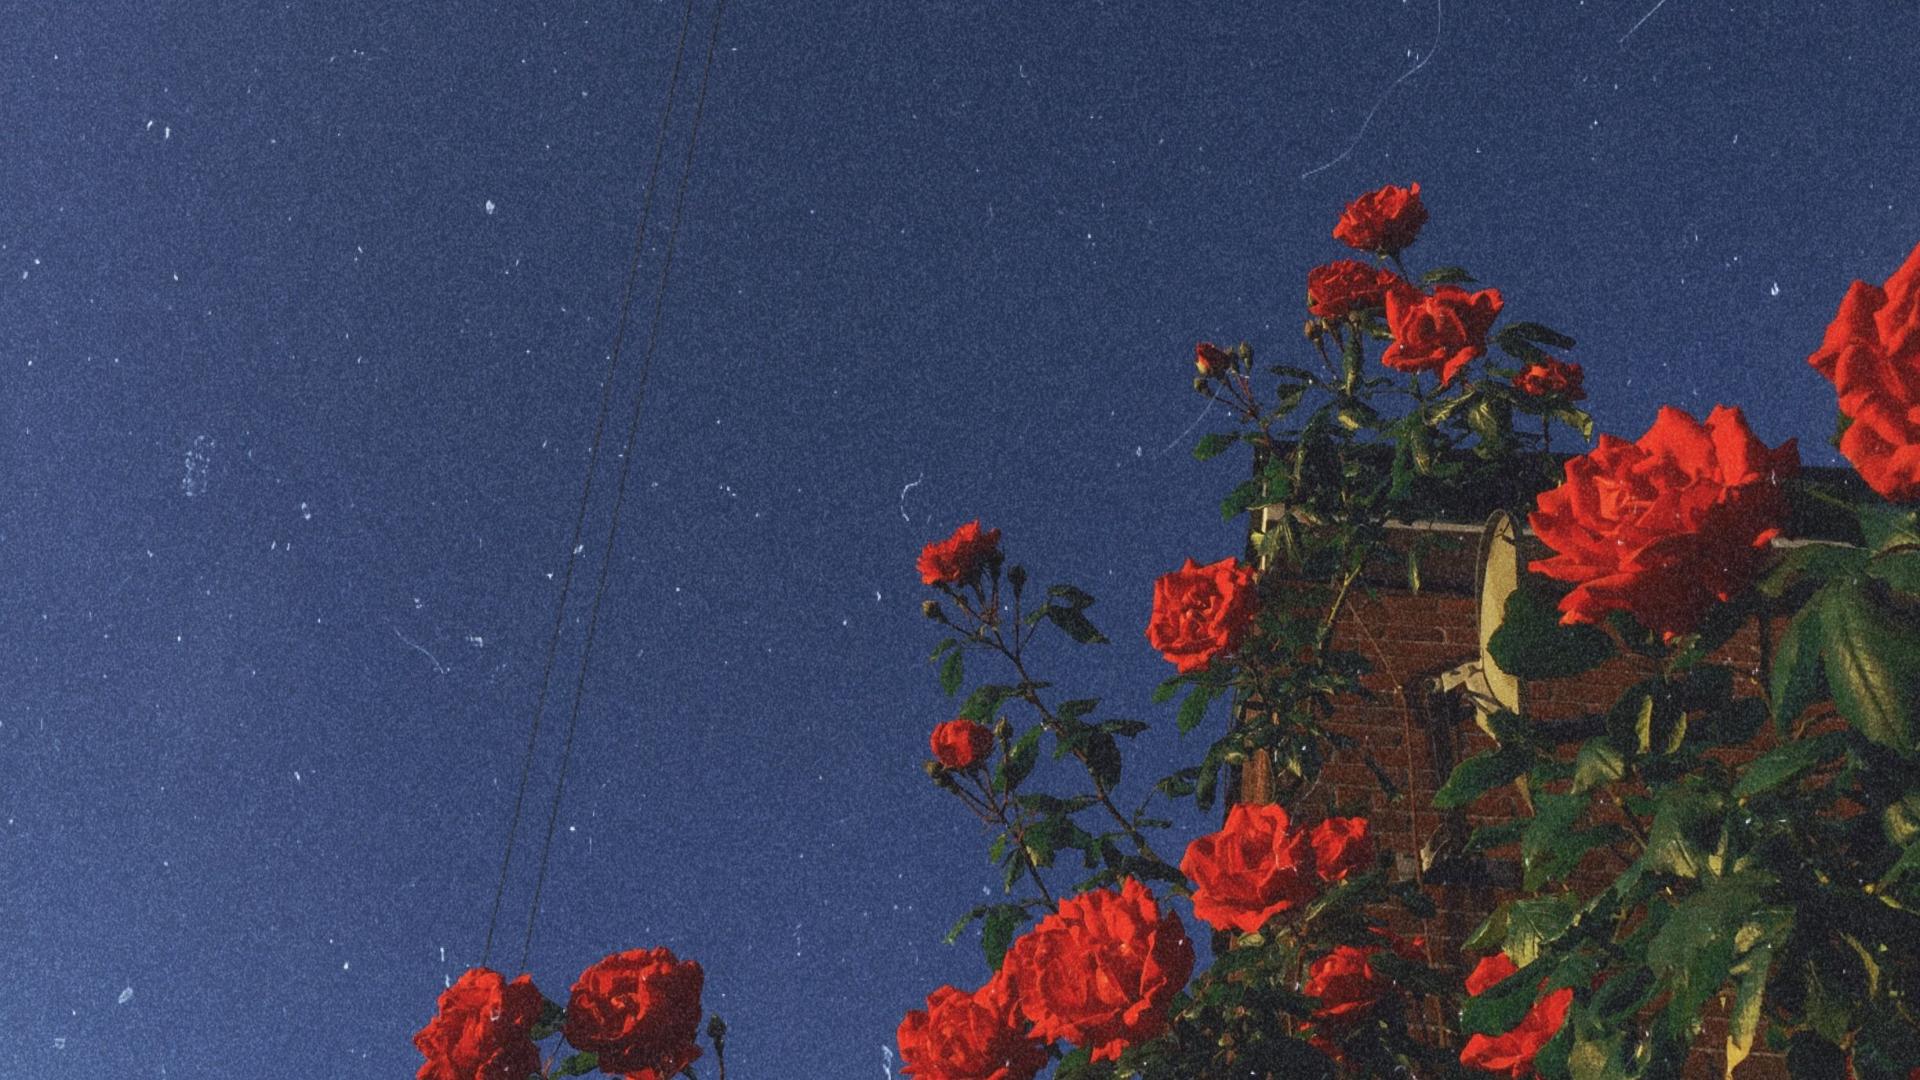 Retro Aesthetic Desktop Wallpaper Tumblr Hd